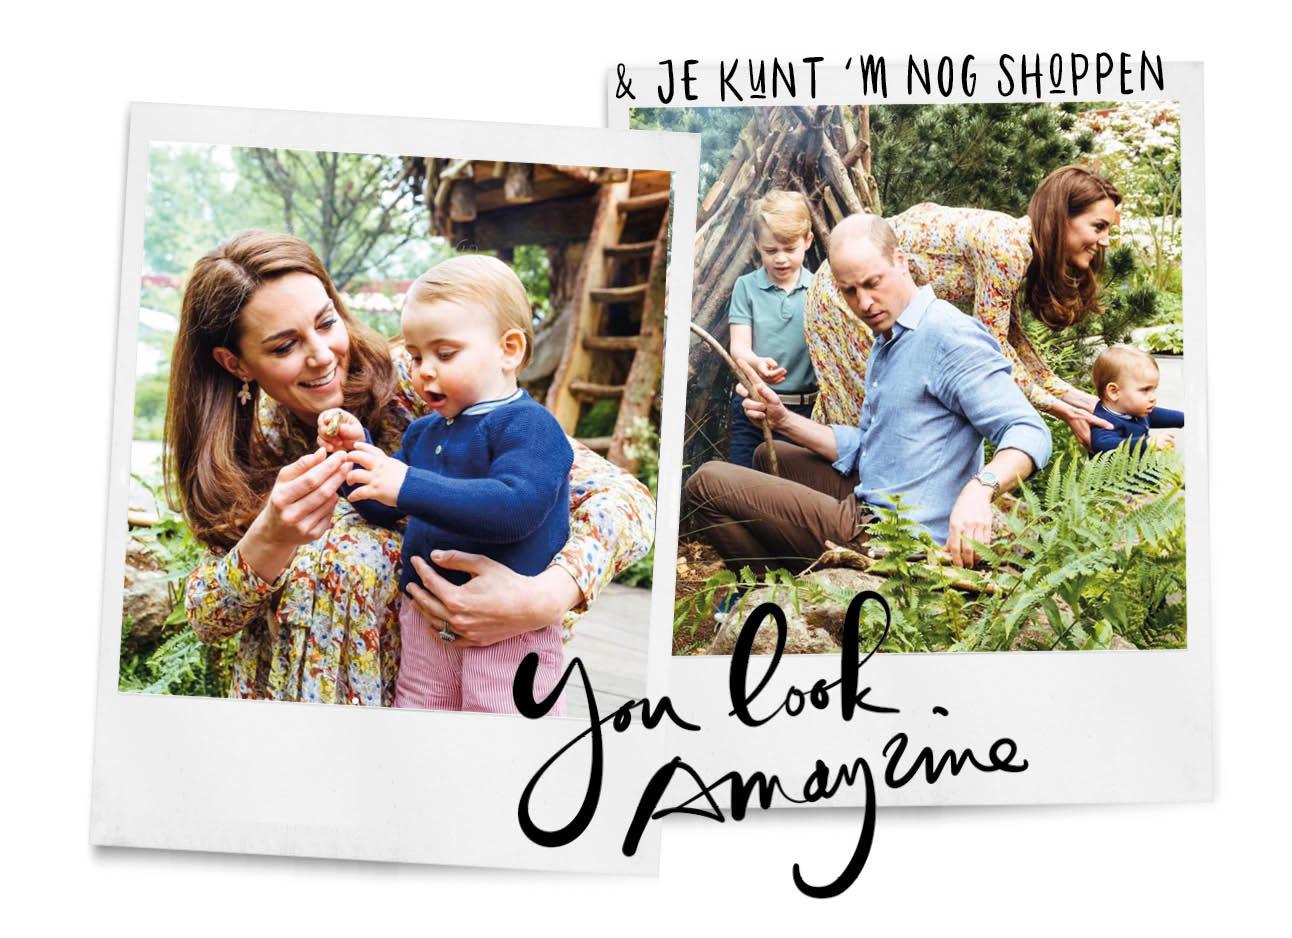 Kate middleton jurk van &Other stories royal family